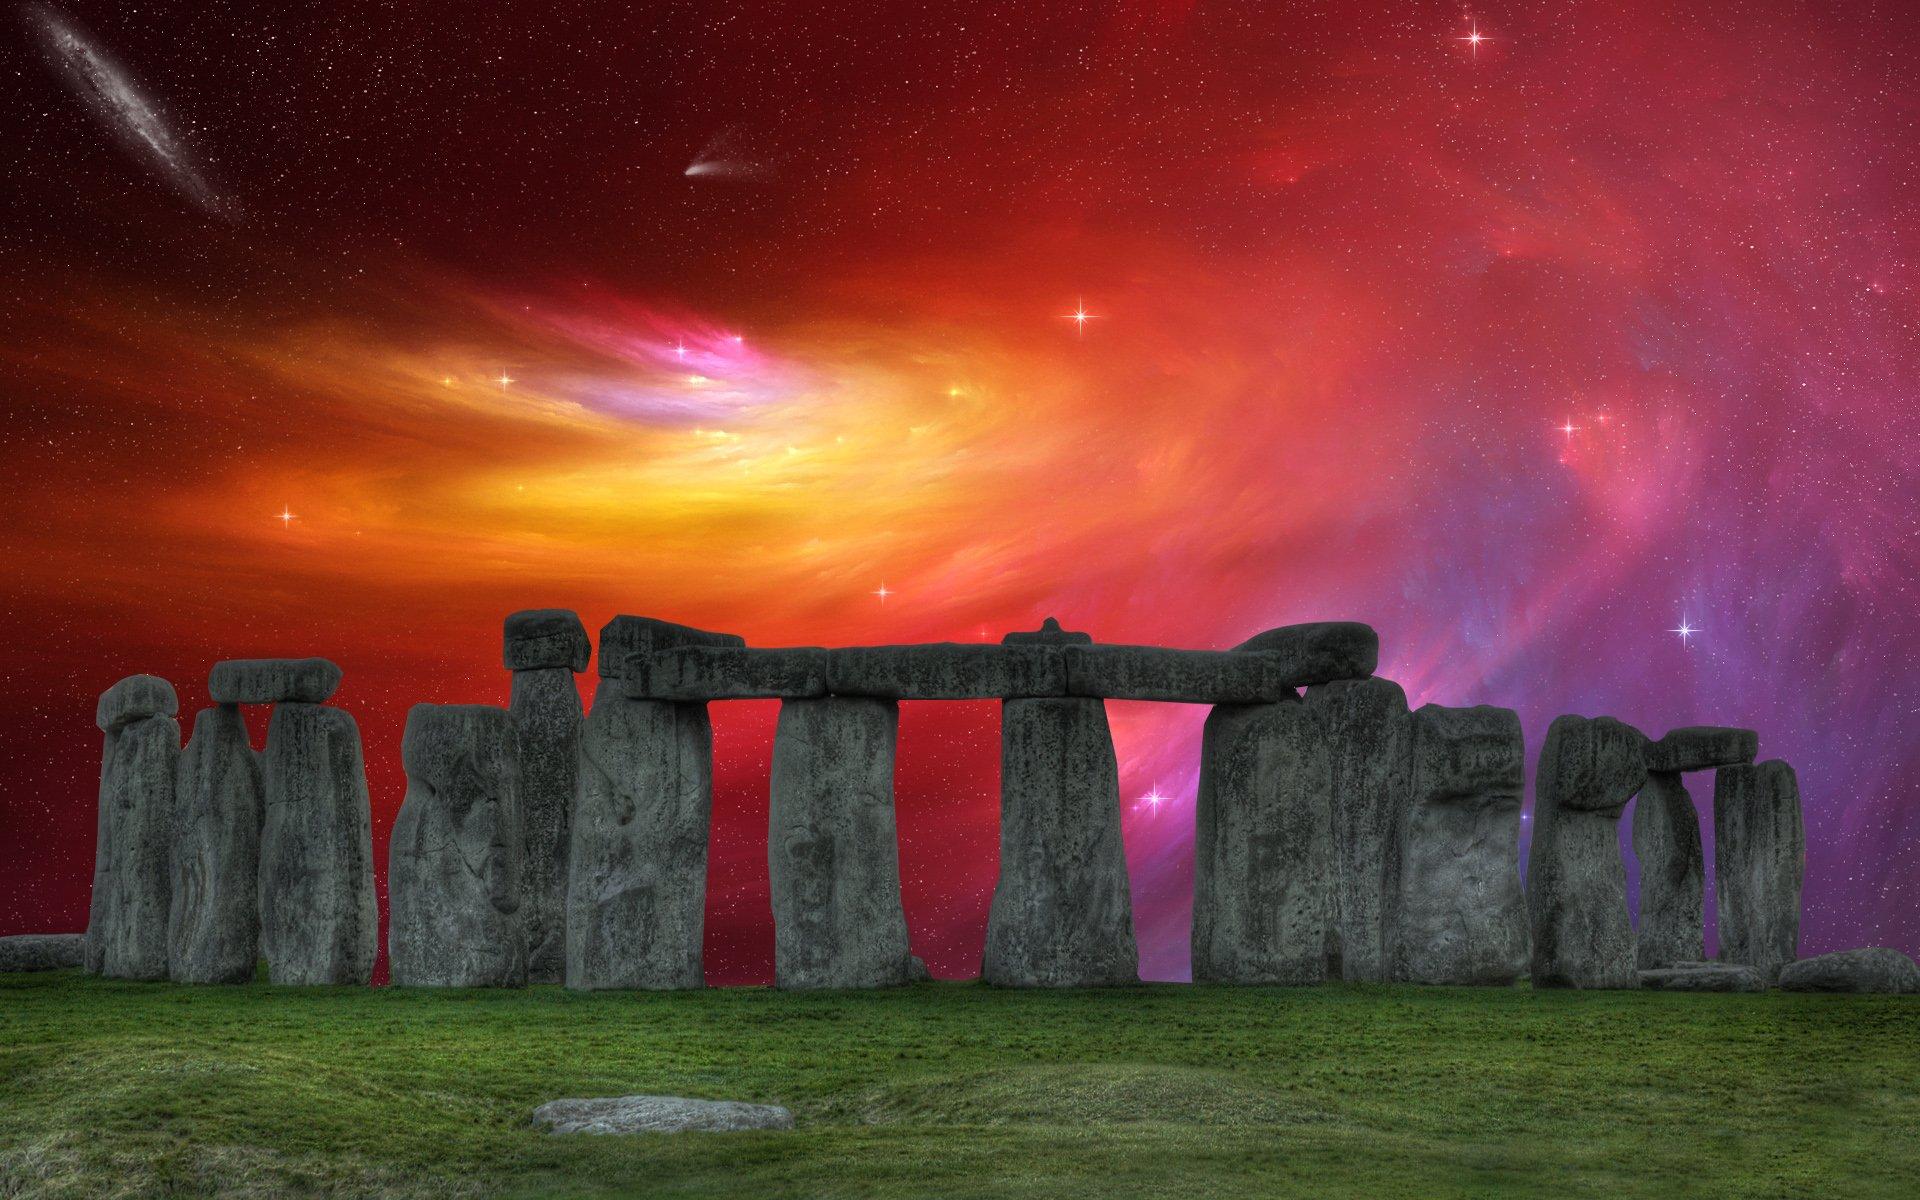 Iphone X Wallpaper Gif Landscape Nebula Sky Over Stonehenge Full Hd Wallpaper And